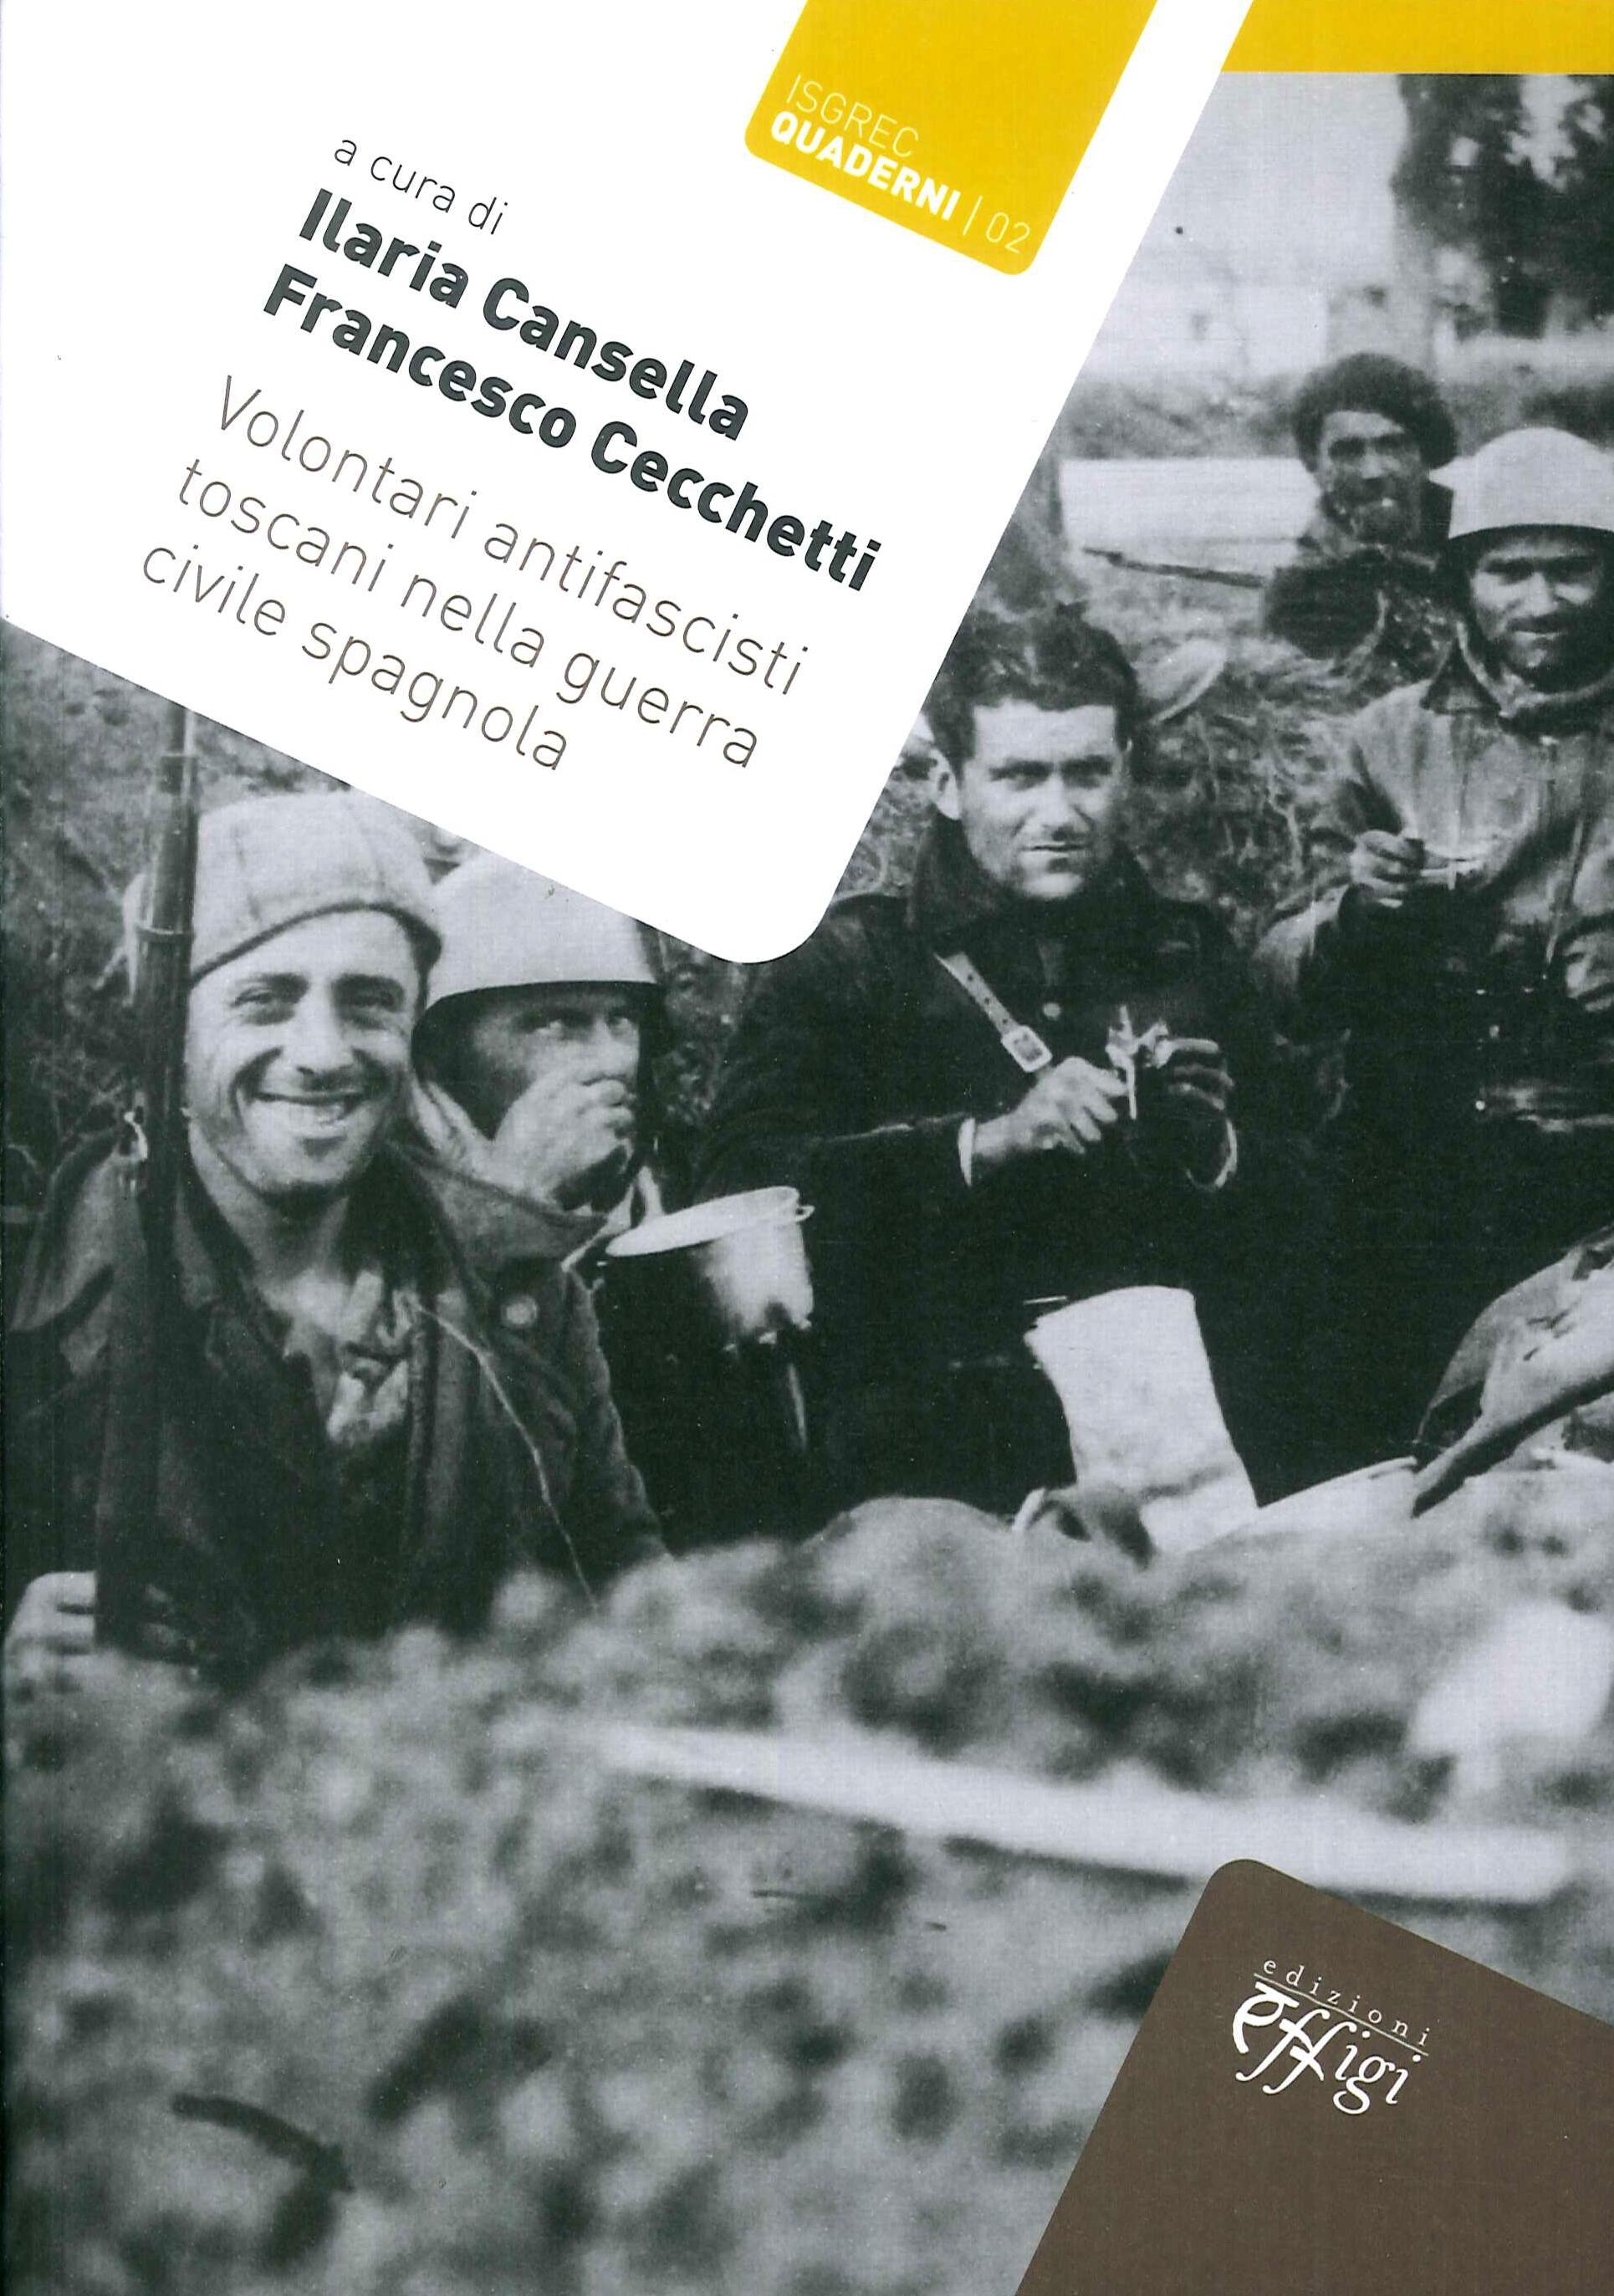 Volontari Antifascisti Toscani nella Guerra Civile Spagnola.